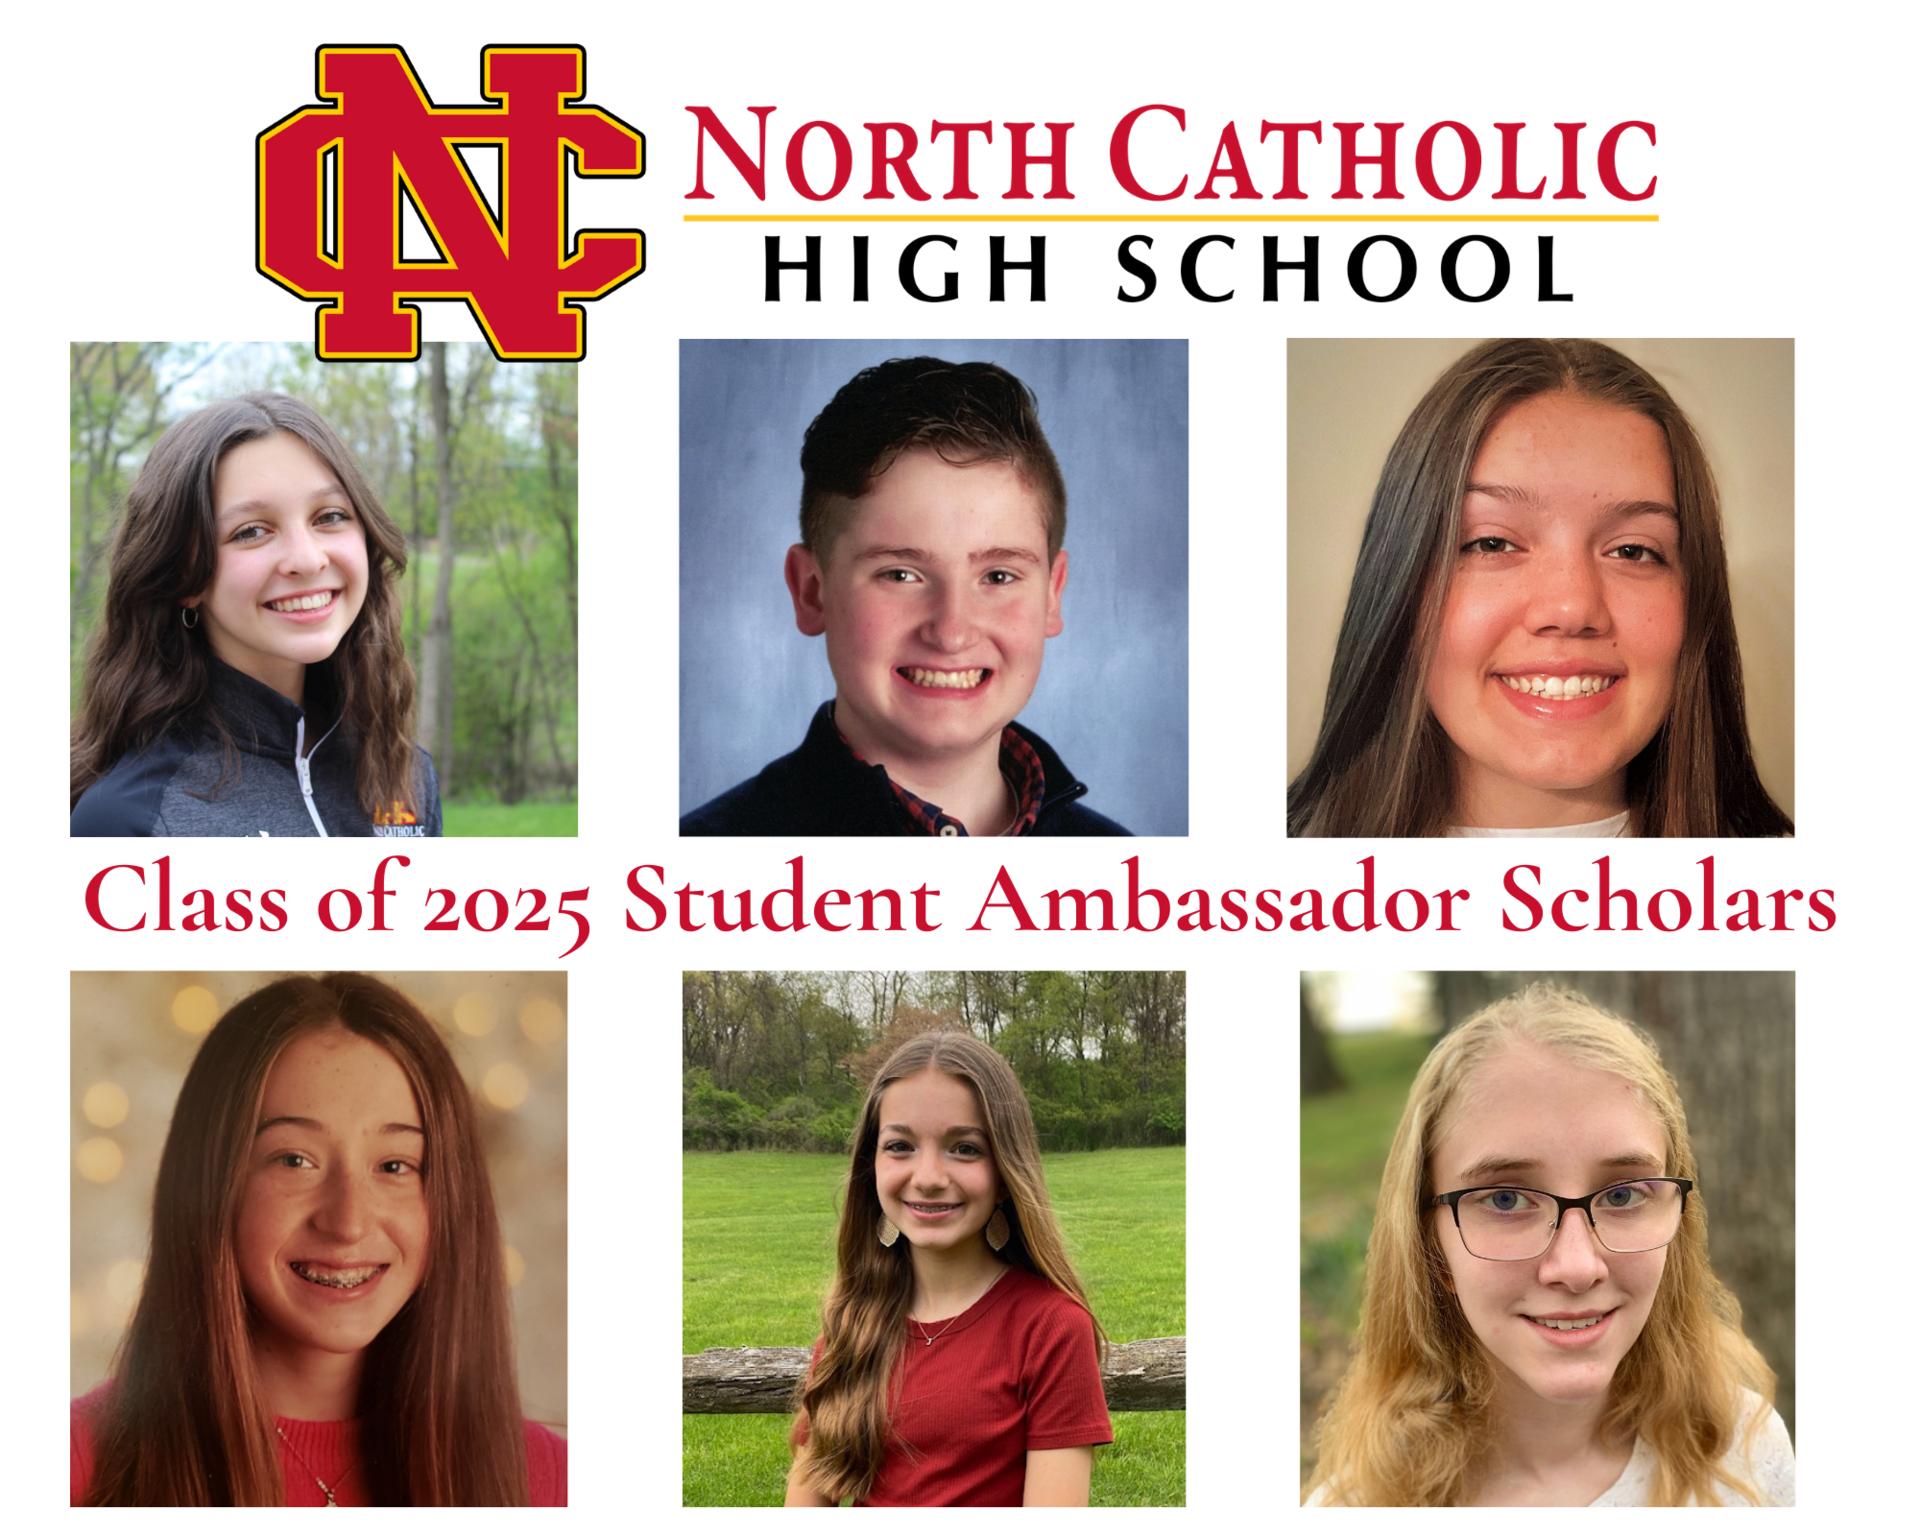 Student Ambassador Scholars